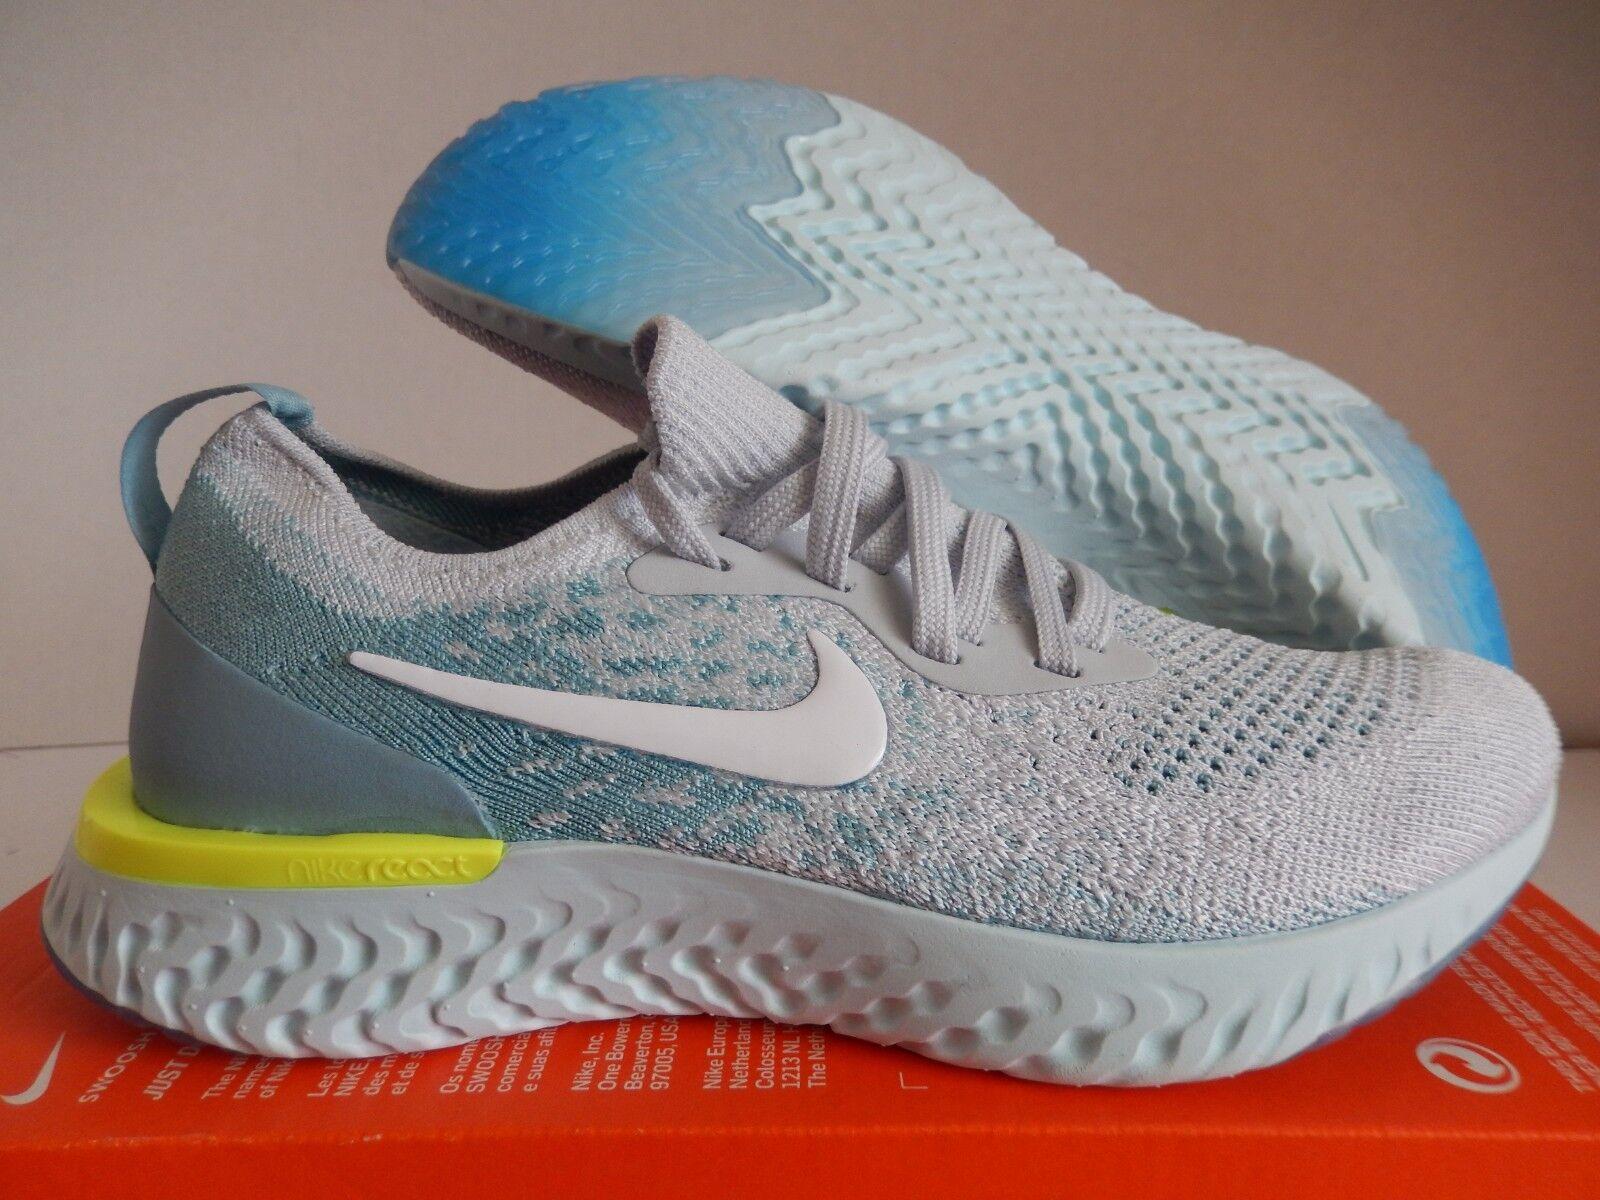 Mujeres Épica Nike Épica Mujeres reaccionar Flyknit Platino Puro-Blanco-Mica Azul [AQ0070-008] 32ab1d